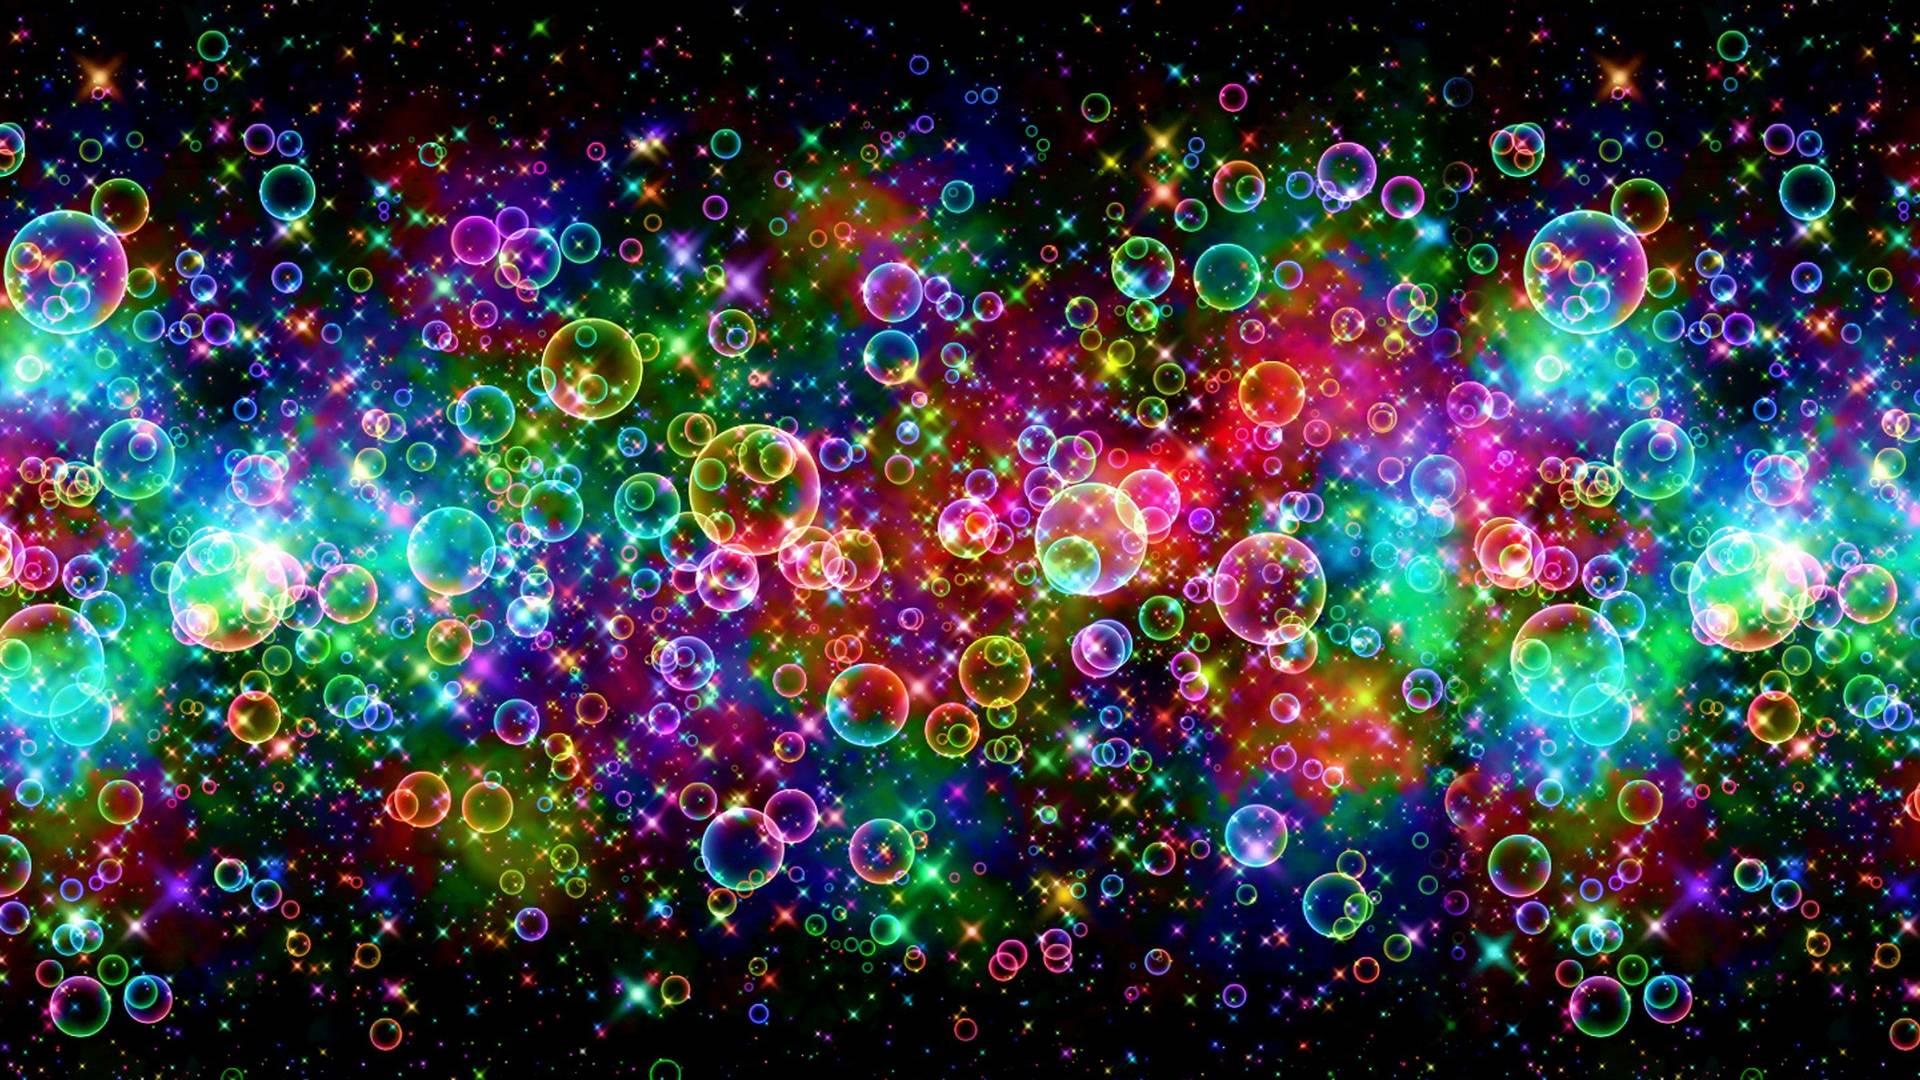 wallpapers tumblr hd colorful -#main